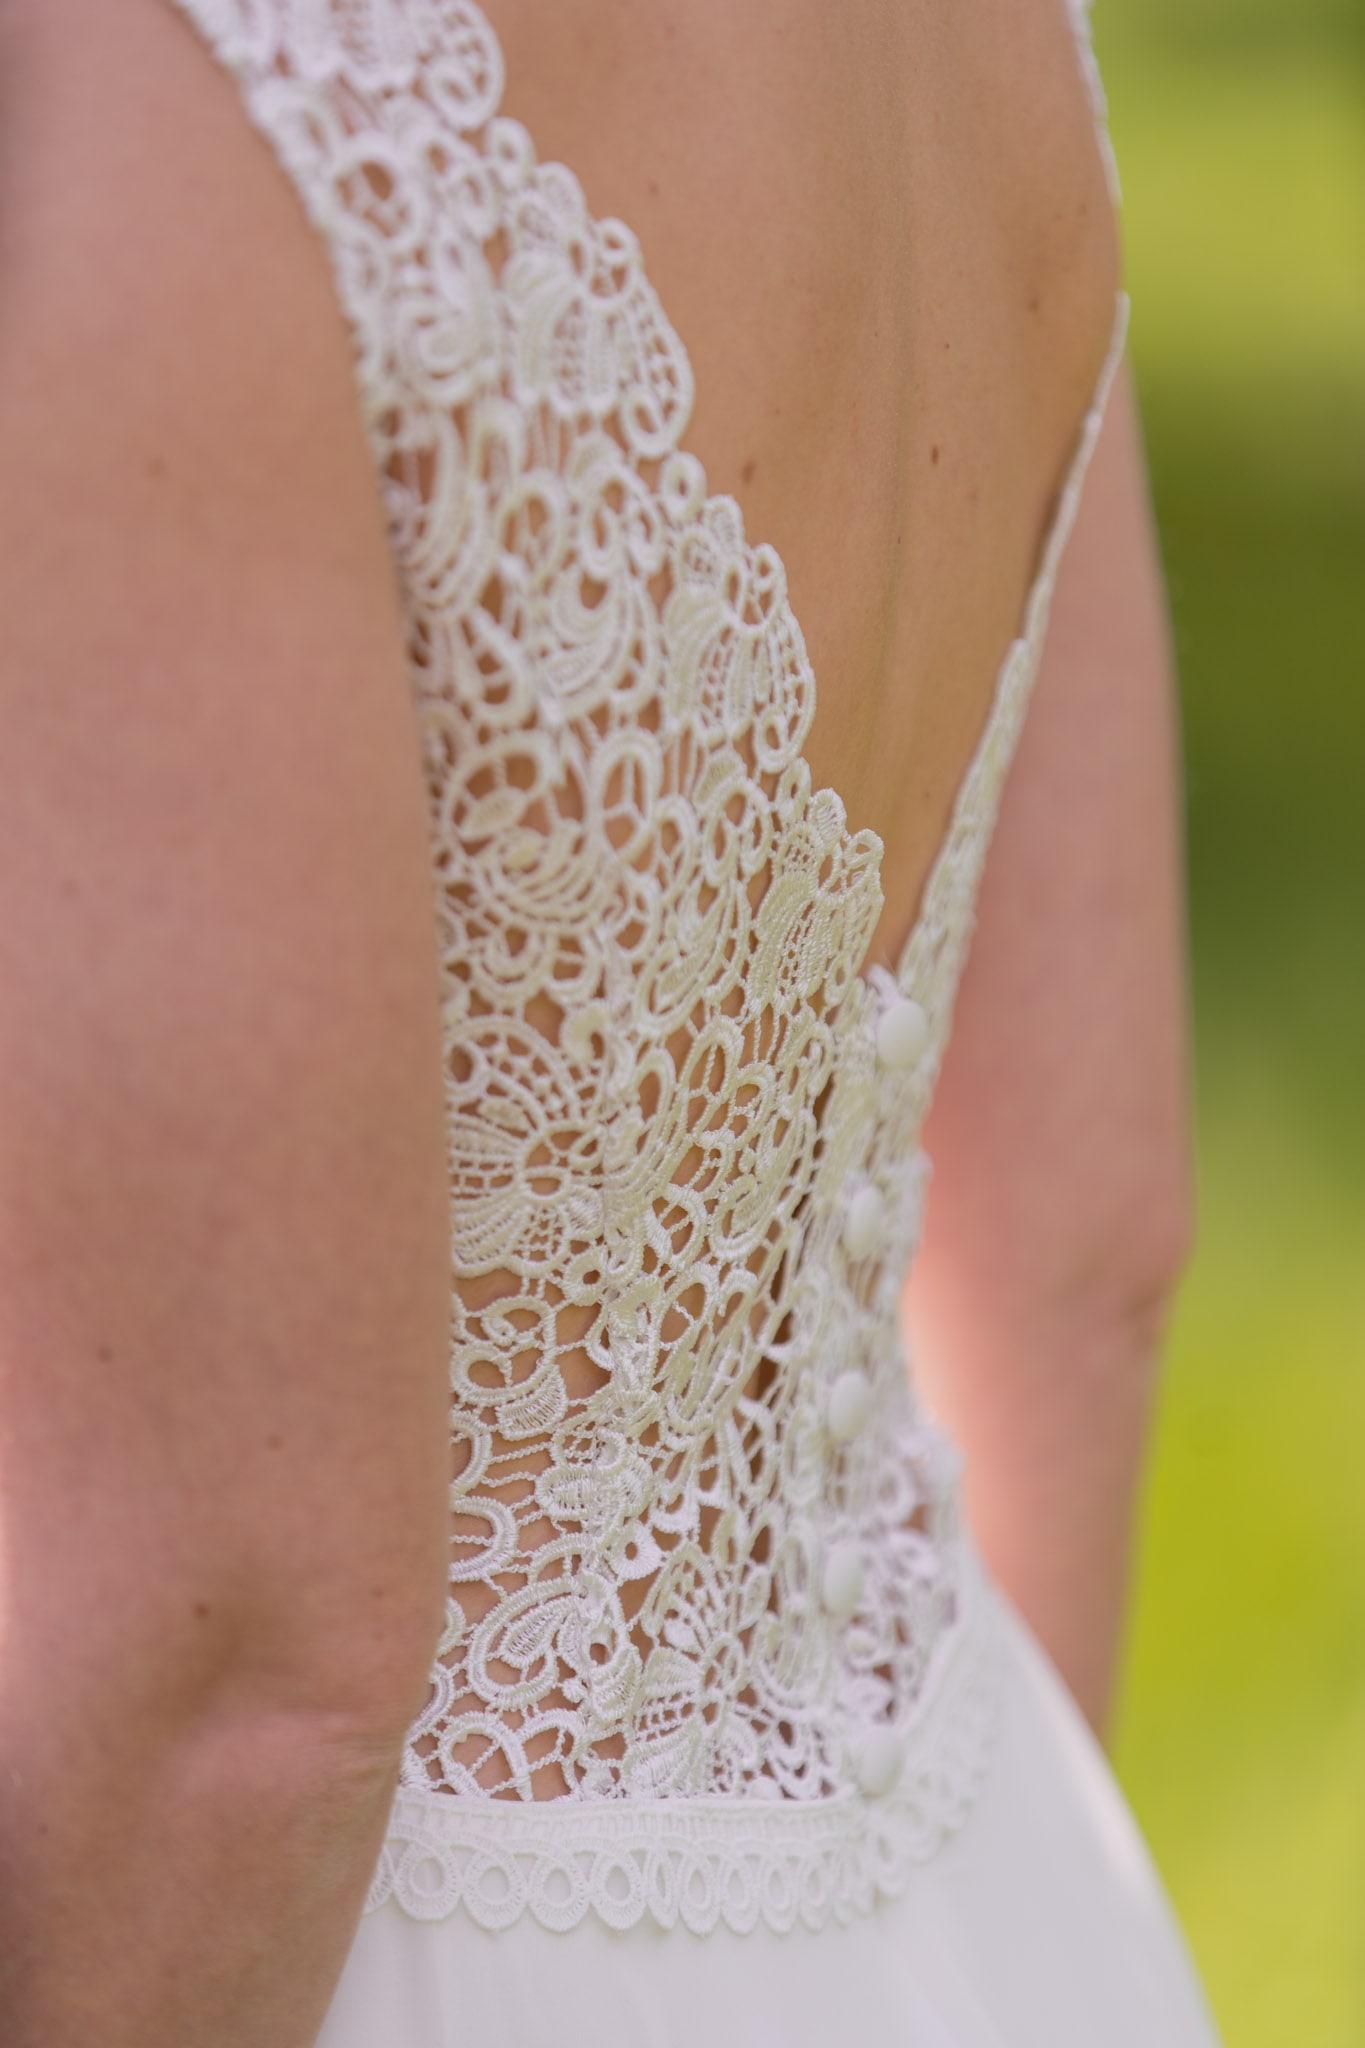 Claudia Heller Modedesign kurzes Brautkleid April 7 min – gesehen bei frauimmer-herrewig.de